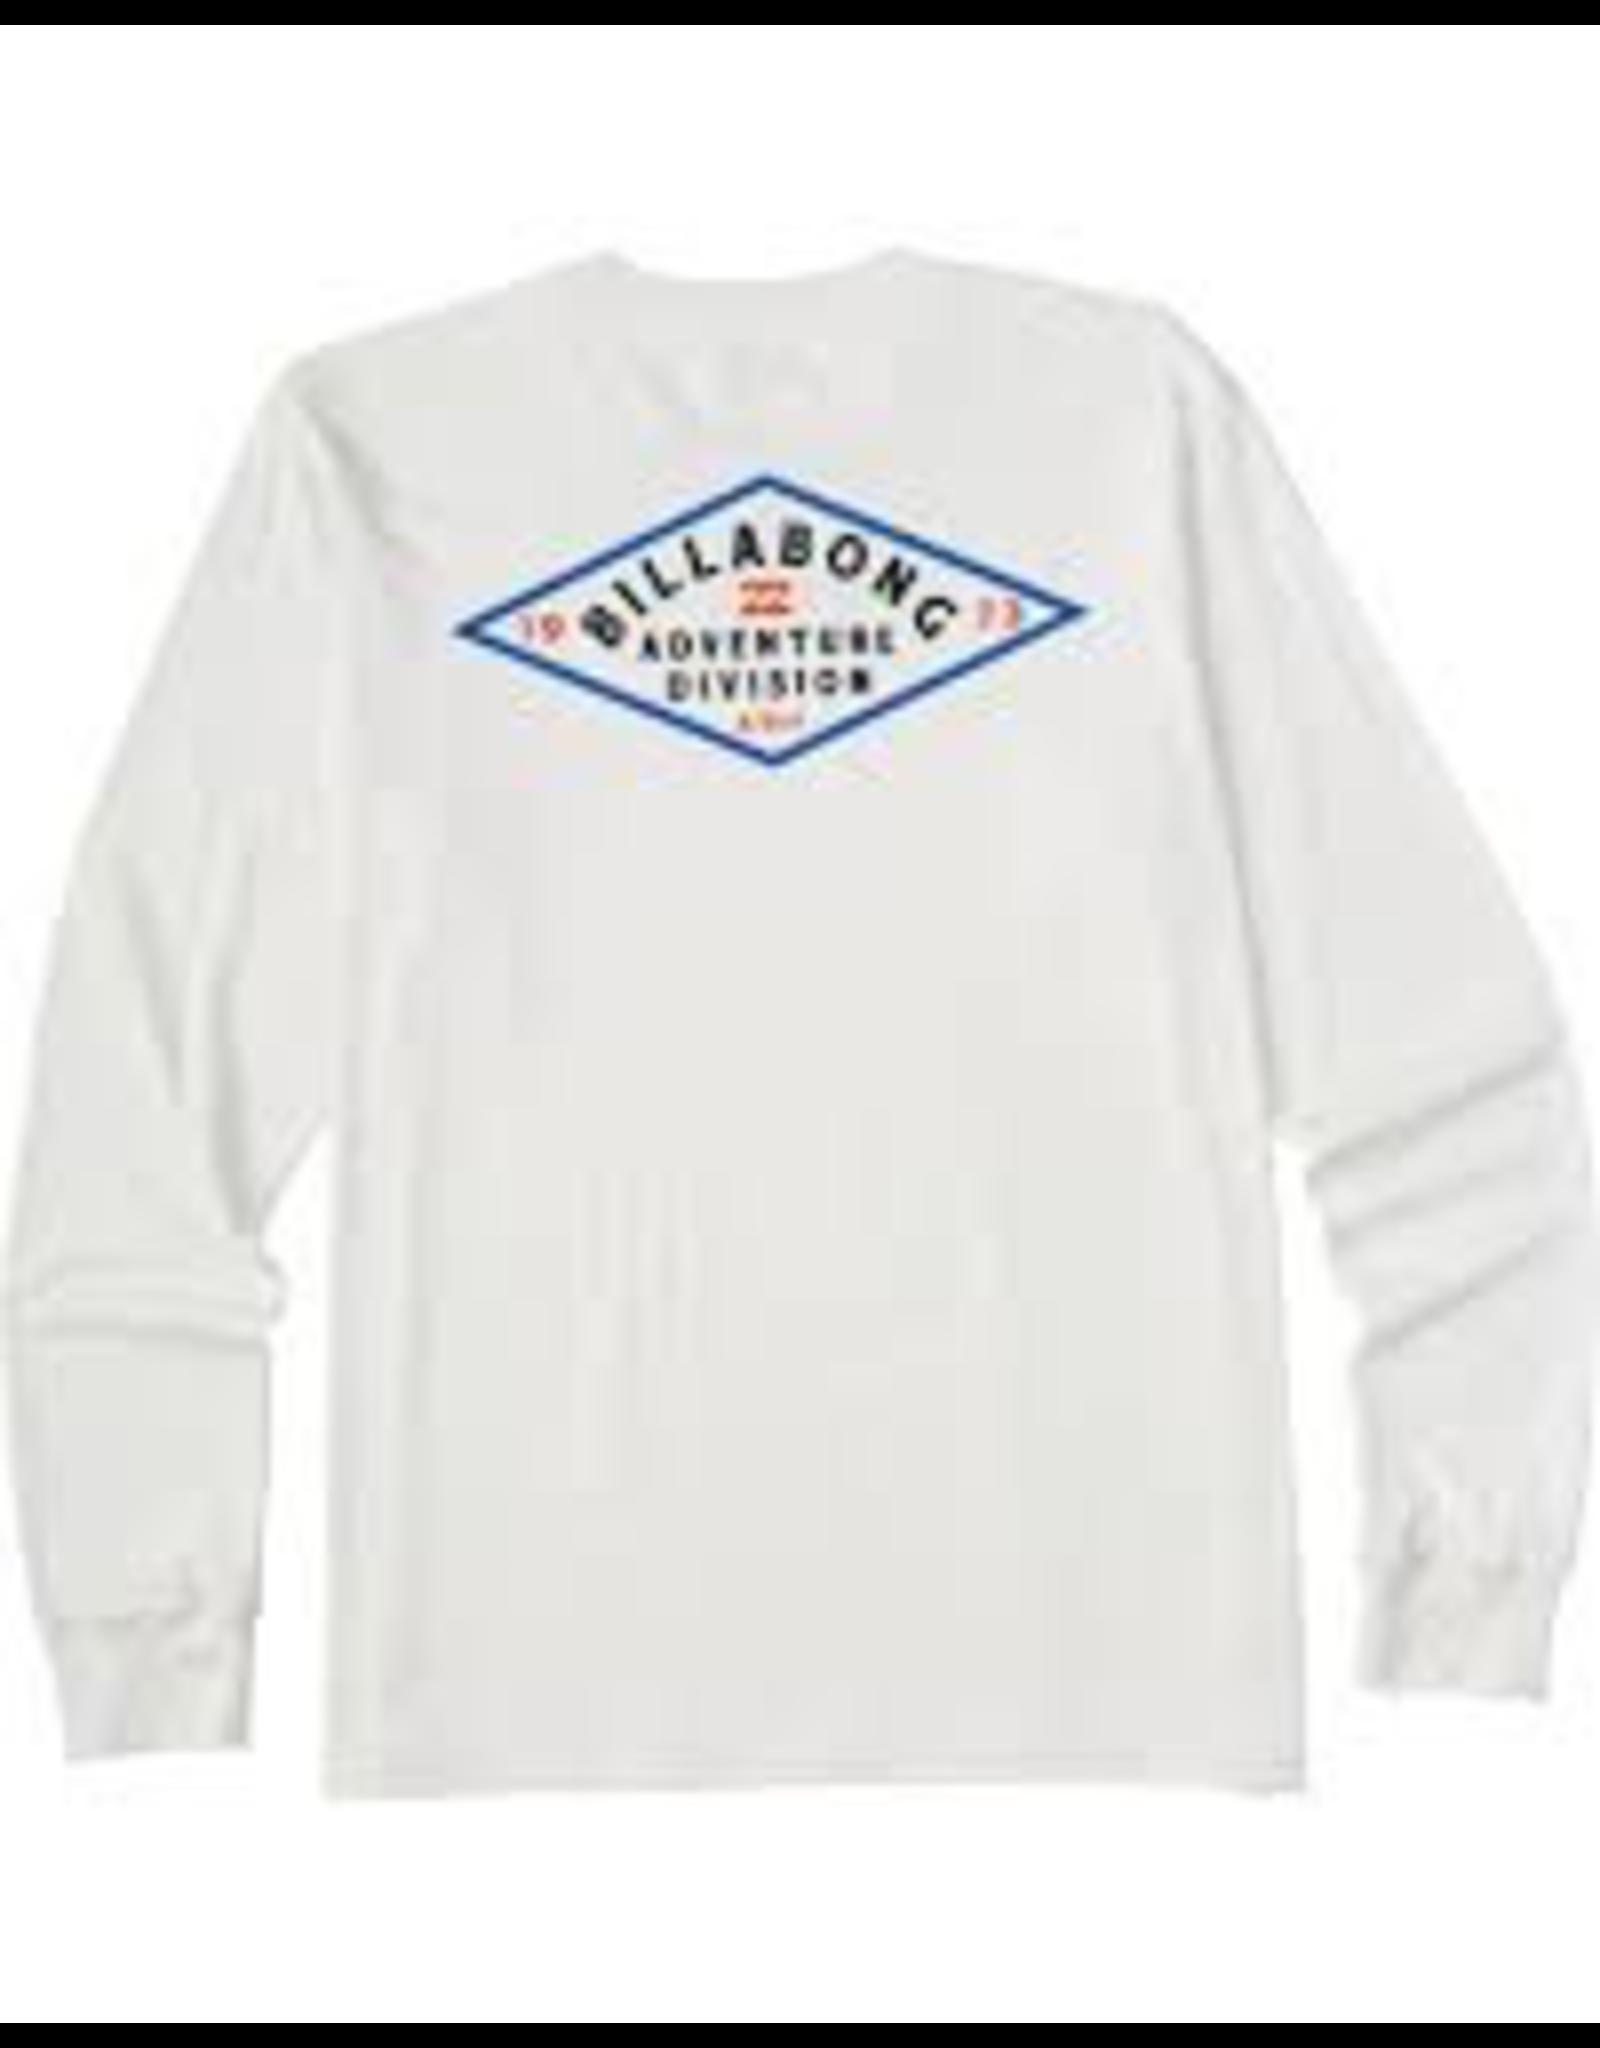 BILLABONG Mens' long sleeve t-shirt.<br /> <br /> Billabong Adventure Division.<br /> Crew neck.<br /> Logo artwork screen printed at chest and back.<br /> Heat seal neck label.<br /> Left side seam flag label.<br /> Premium combed ringspun jersey.